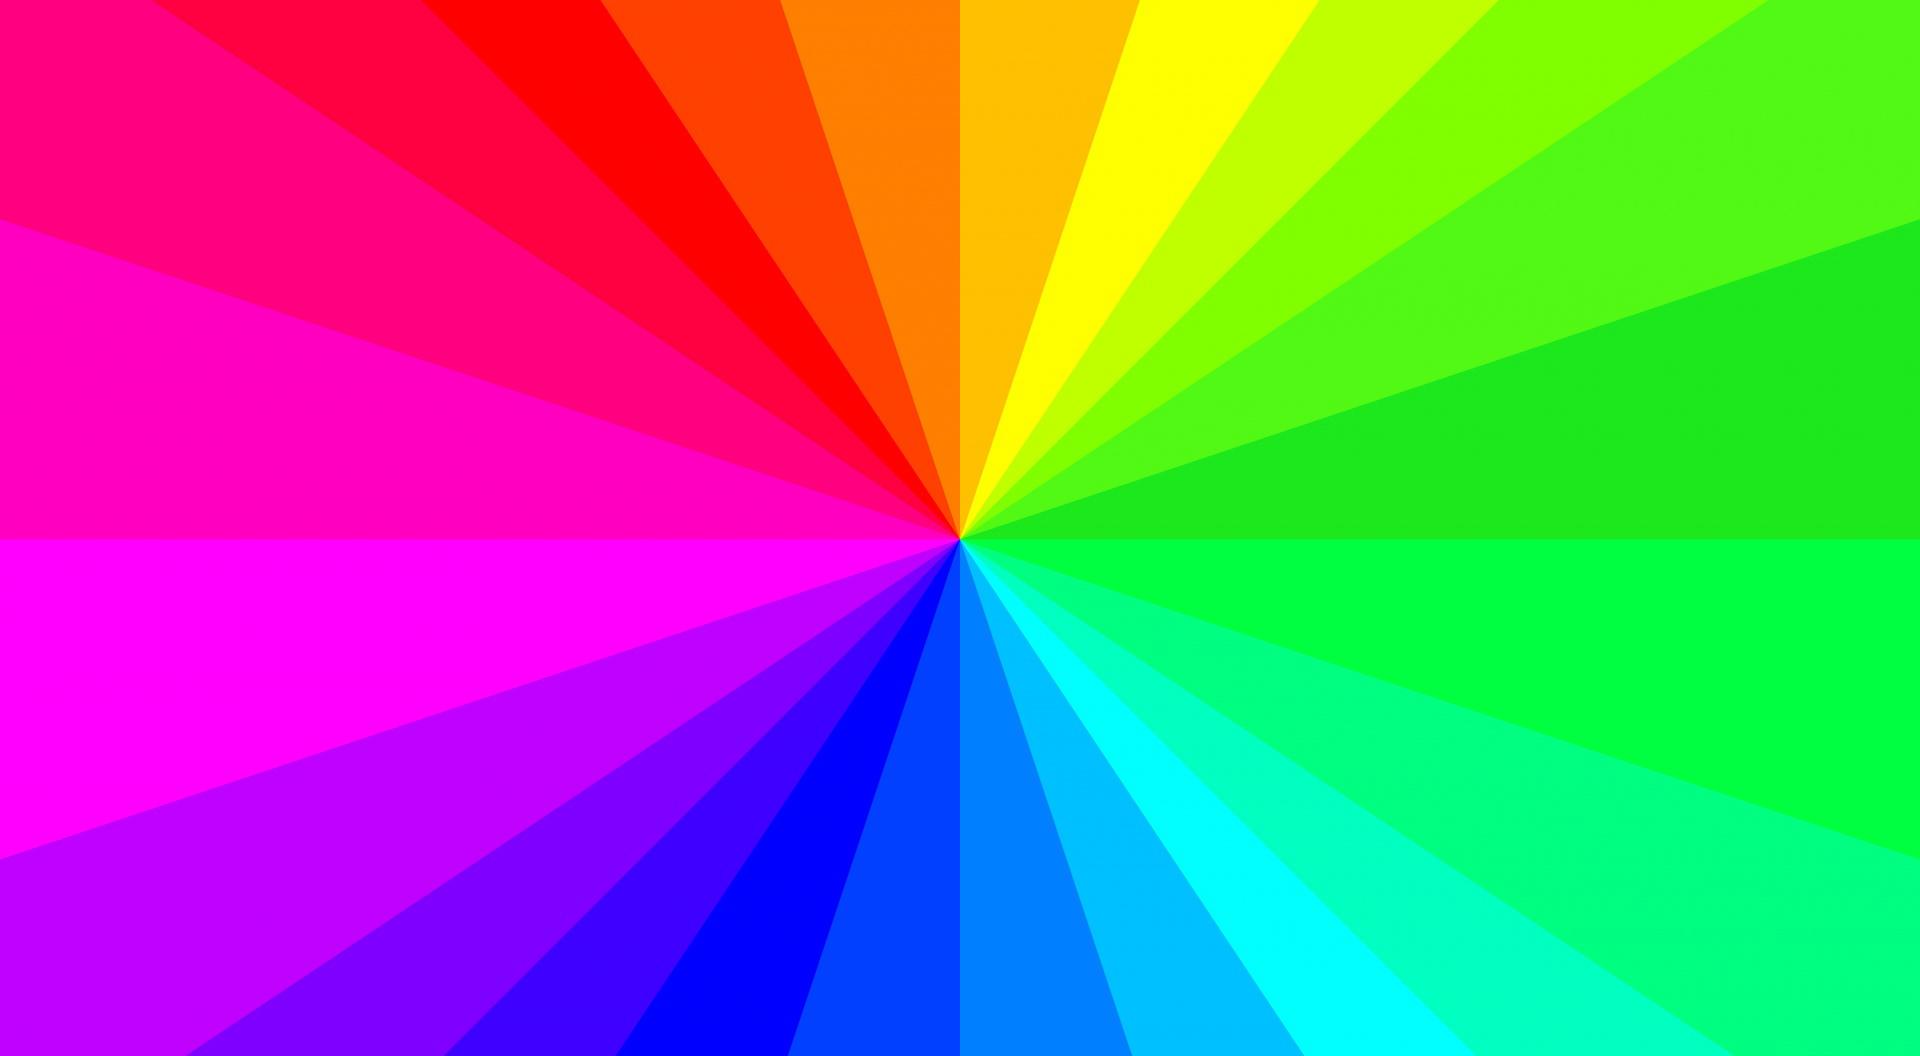 Free Animated Fall Wallpaper Free Download Rainbow Backgrounds Pixelstalk Net